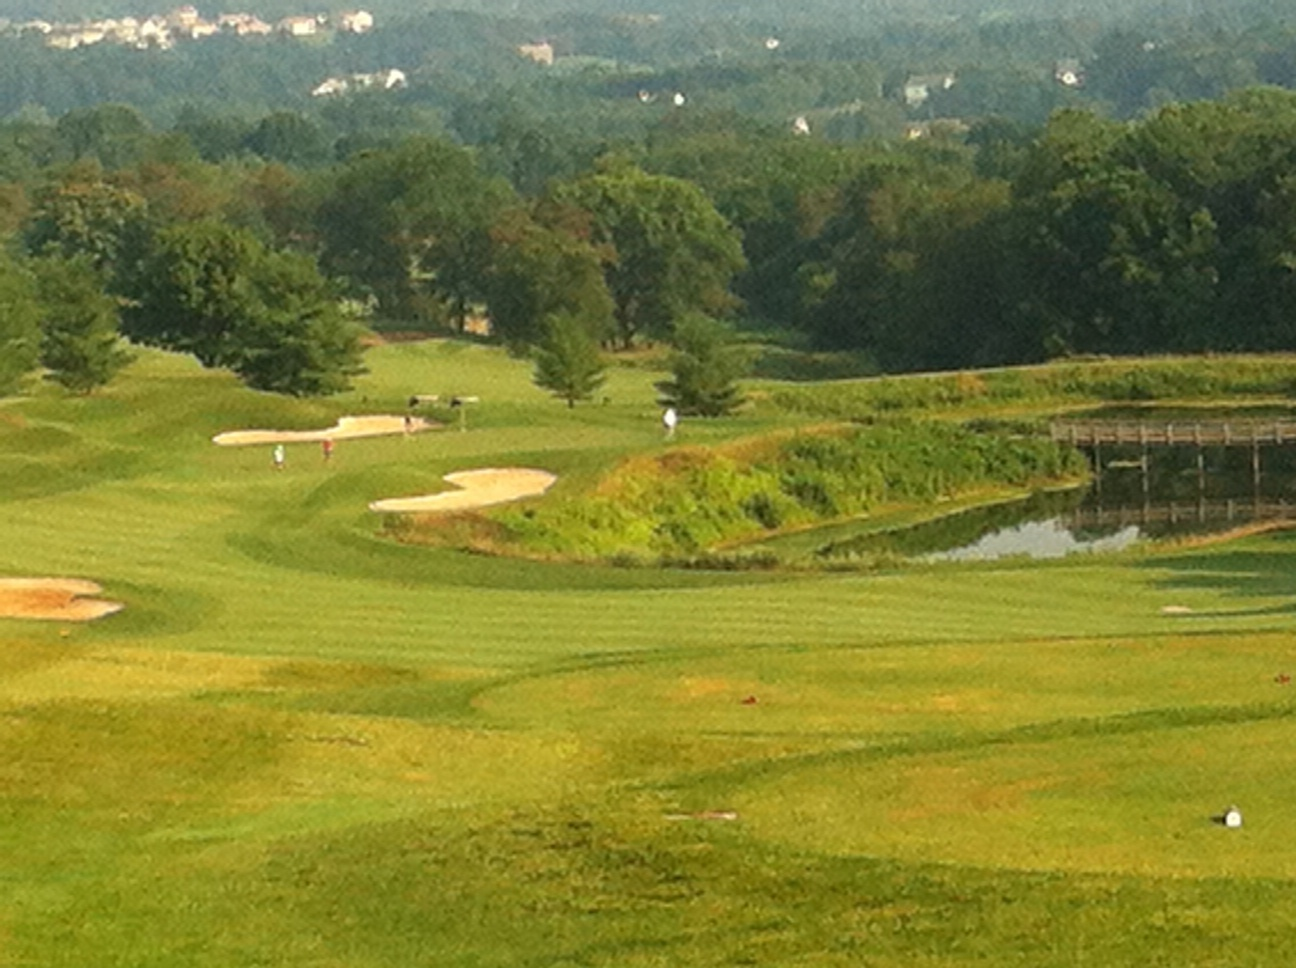 Backyard Golf Course Design golf golf golf david pelzs backyard practice area From